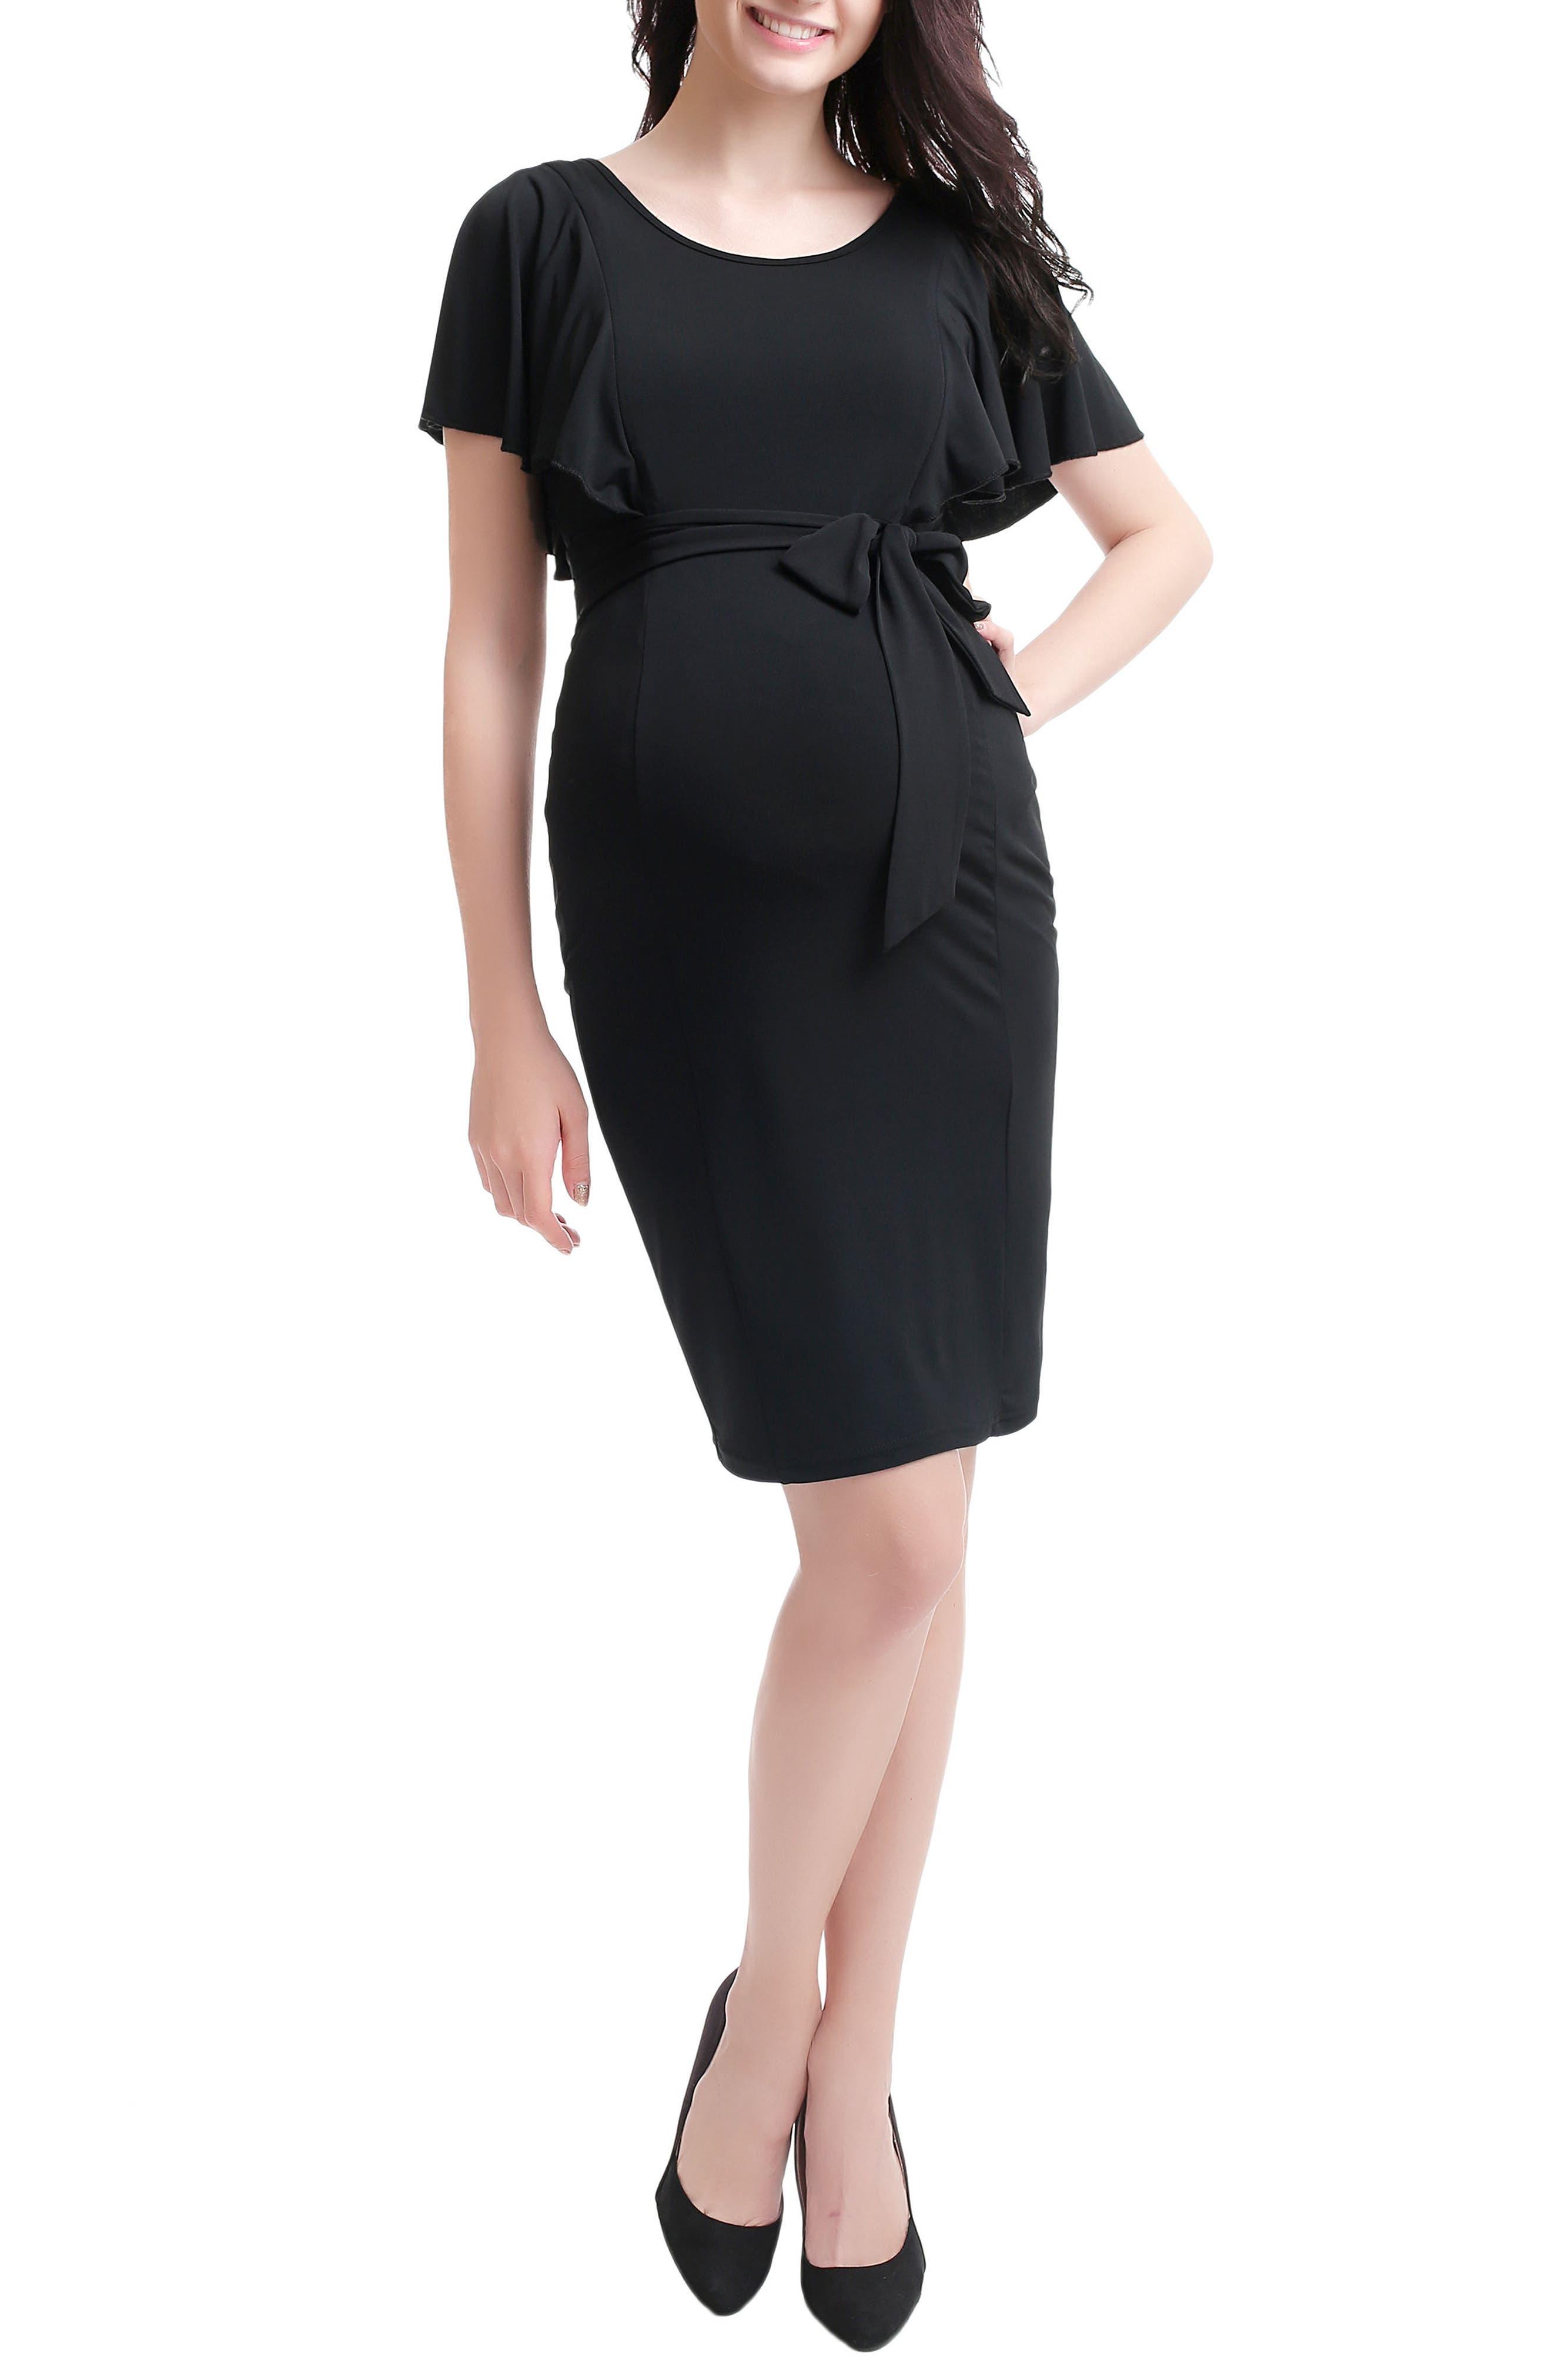 KIMI AND KAI Makayla Maternity/Nursing Dress, Main, color, 001